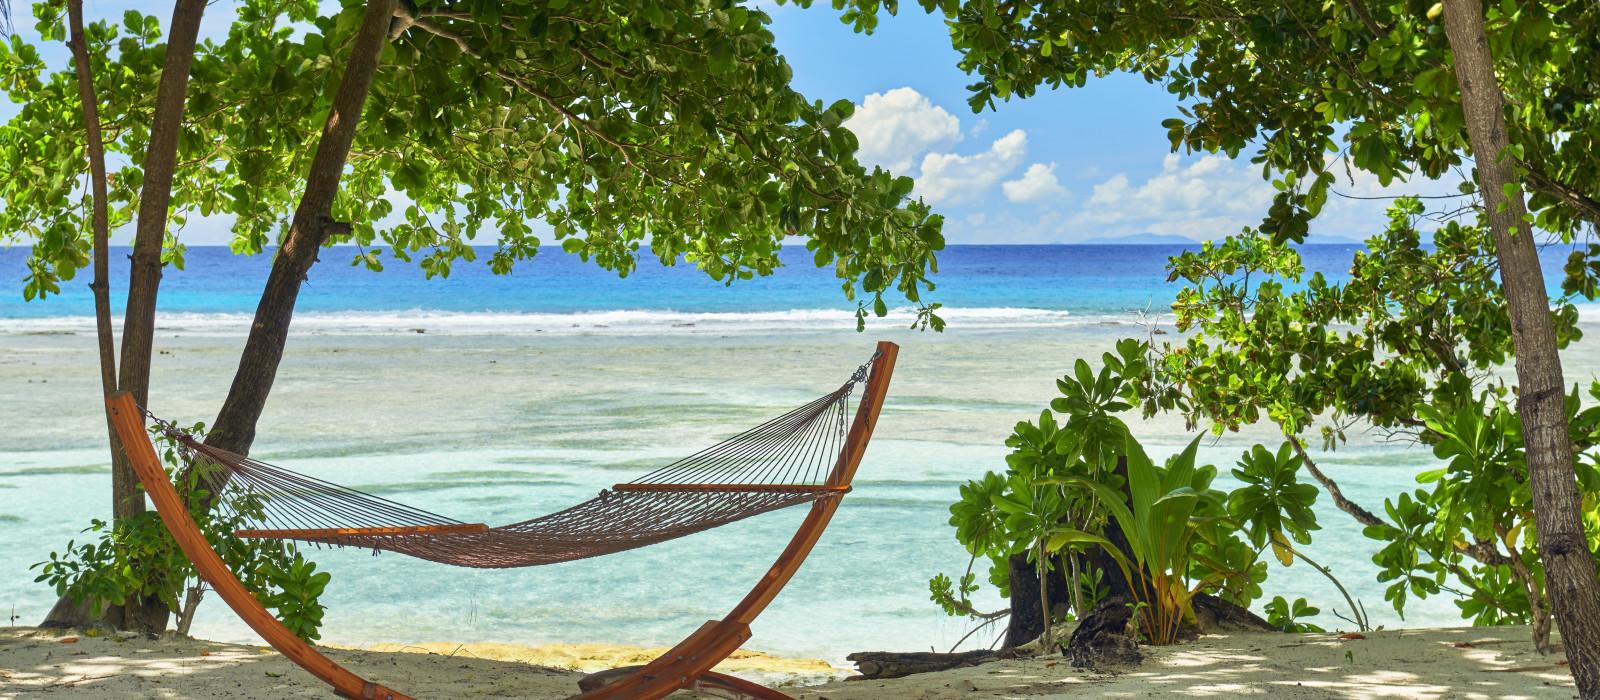 Reiseziel Silhouette Island Seychellen